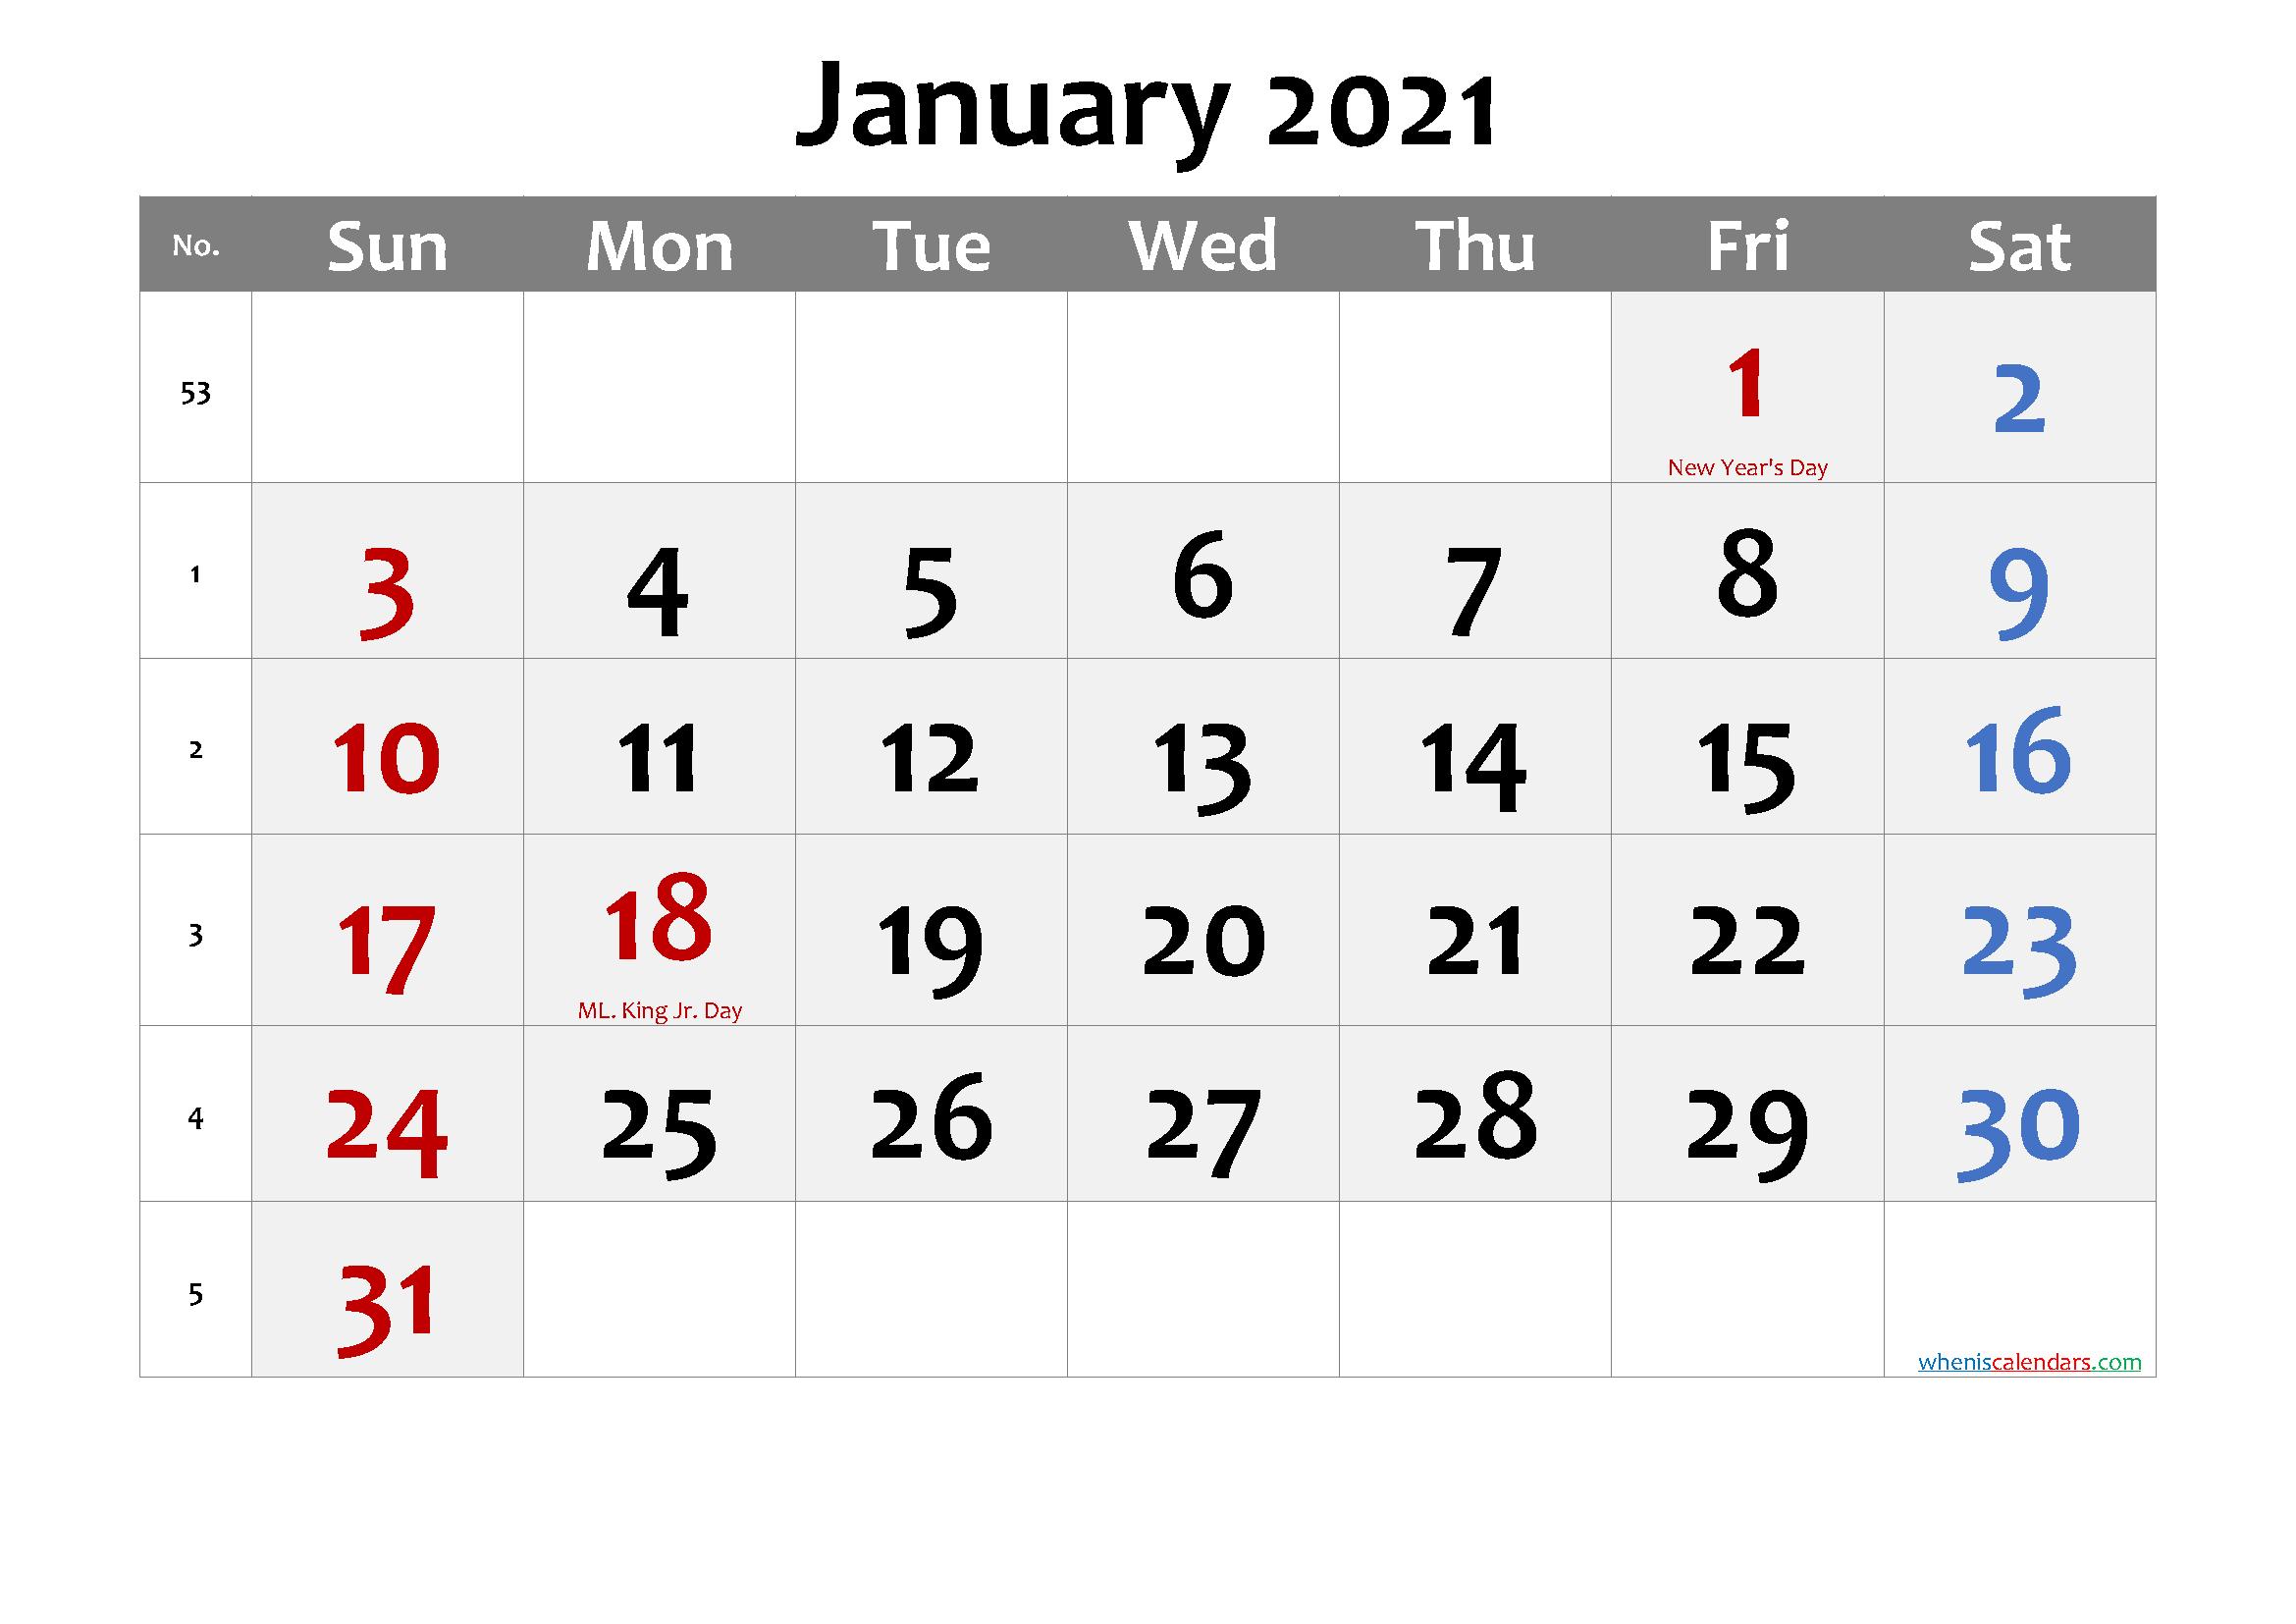 January 2021 Calendar with Holidays Printable